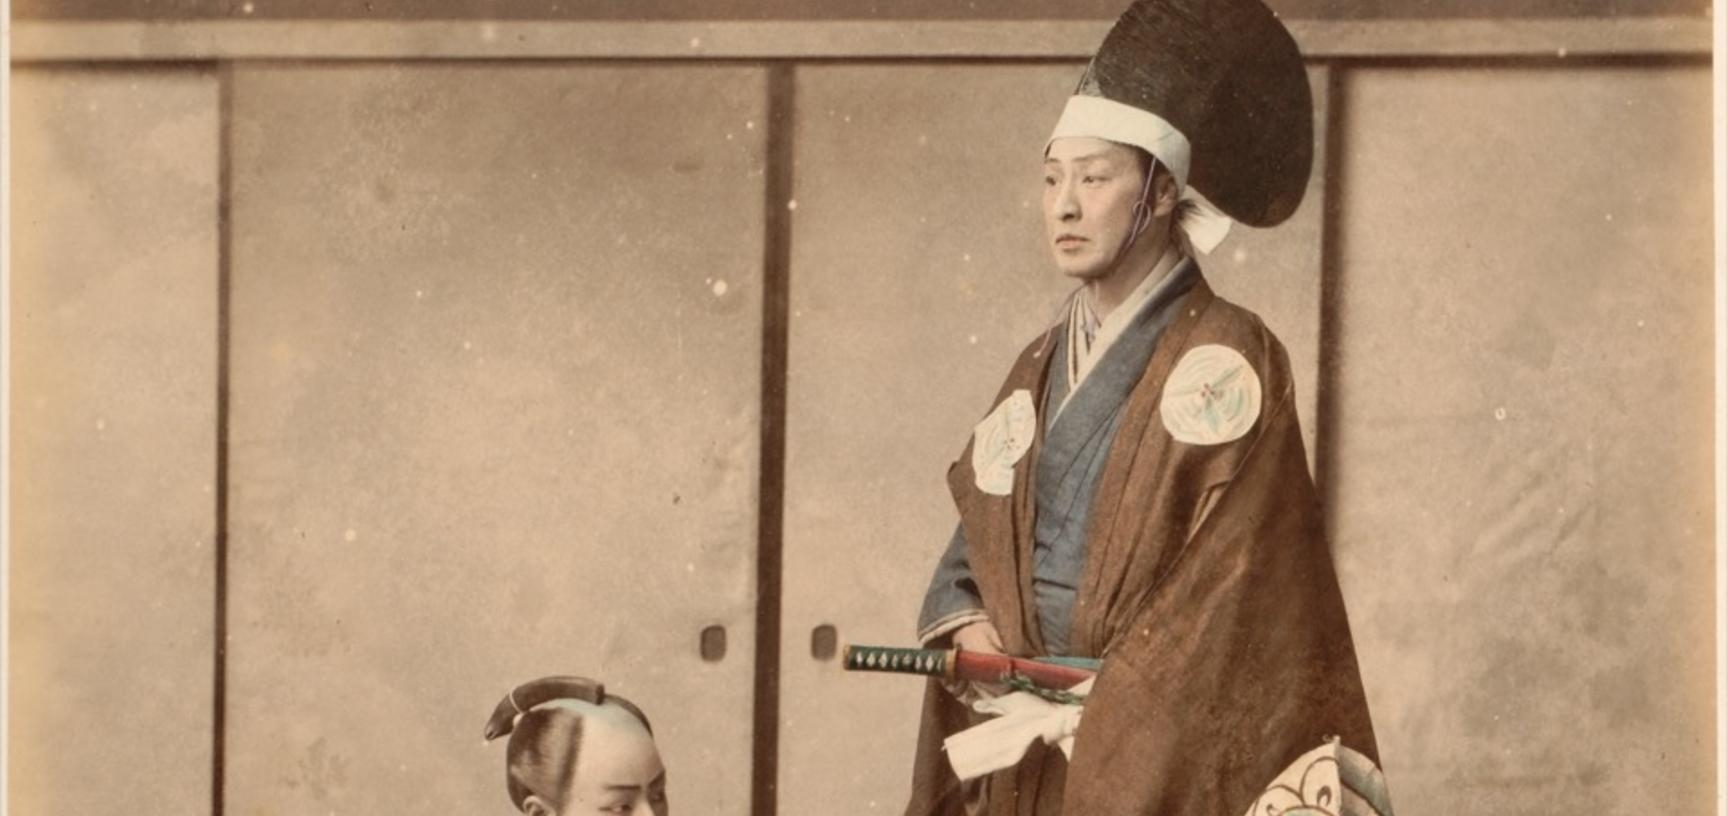 Studio portrait of a man dressed as a daimyō, one of the great landowning lords of feudal Japan and a vassal of the Shogun. Photograph by the Adolfo Farsari studio ('A. Farsari & Co.'). Yokohama, Japan. Circa late 1880s. (Copyright Pitt Rivers Museum, Uni